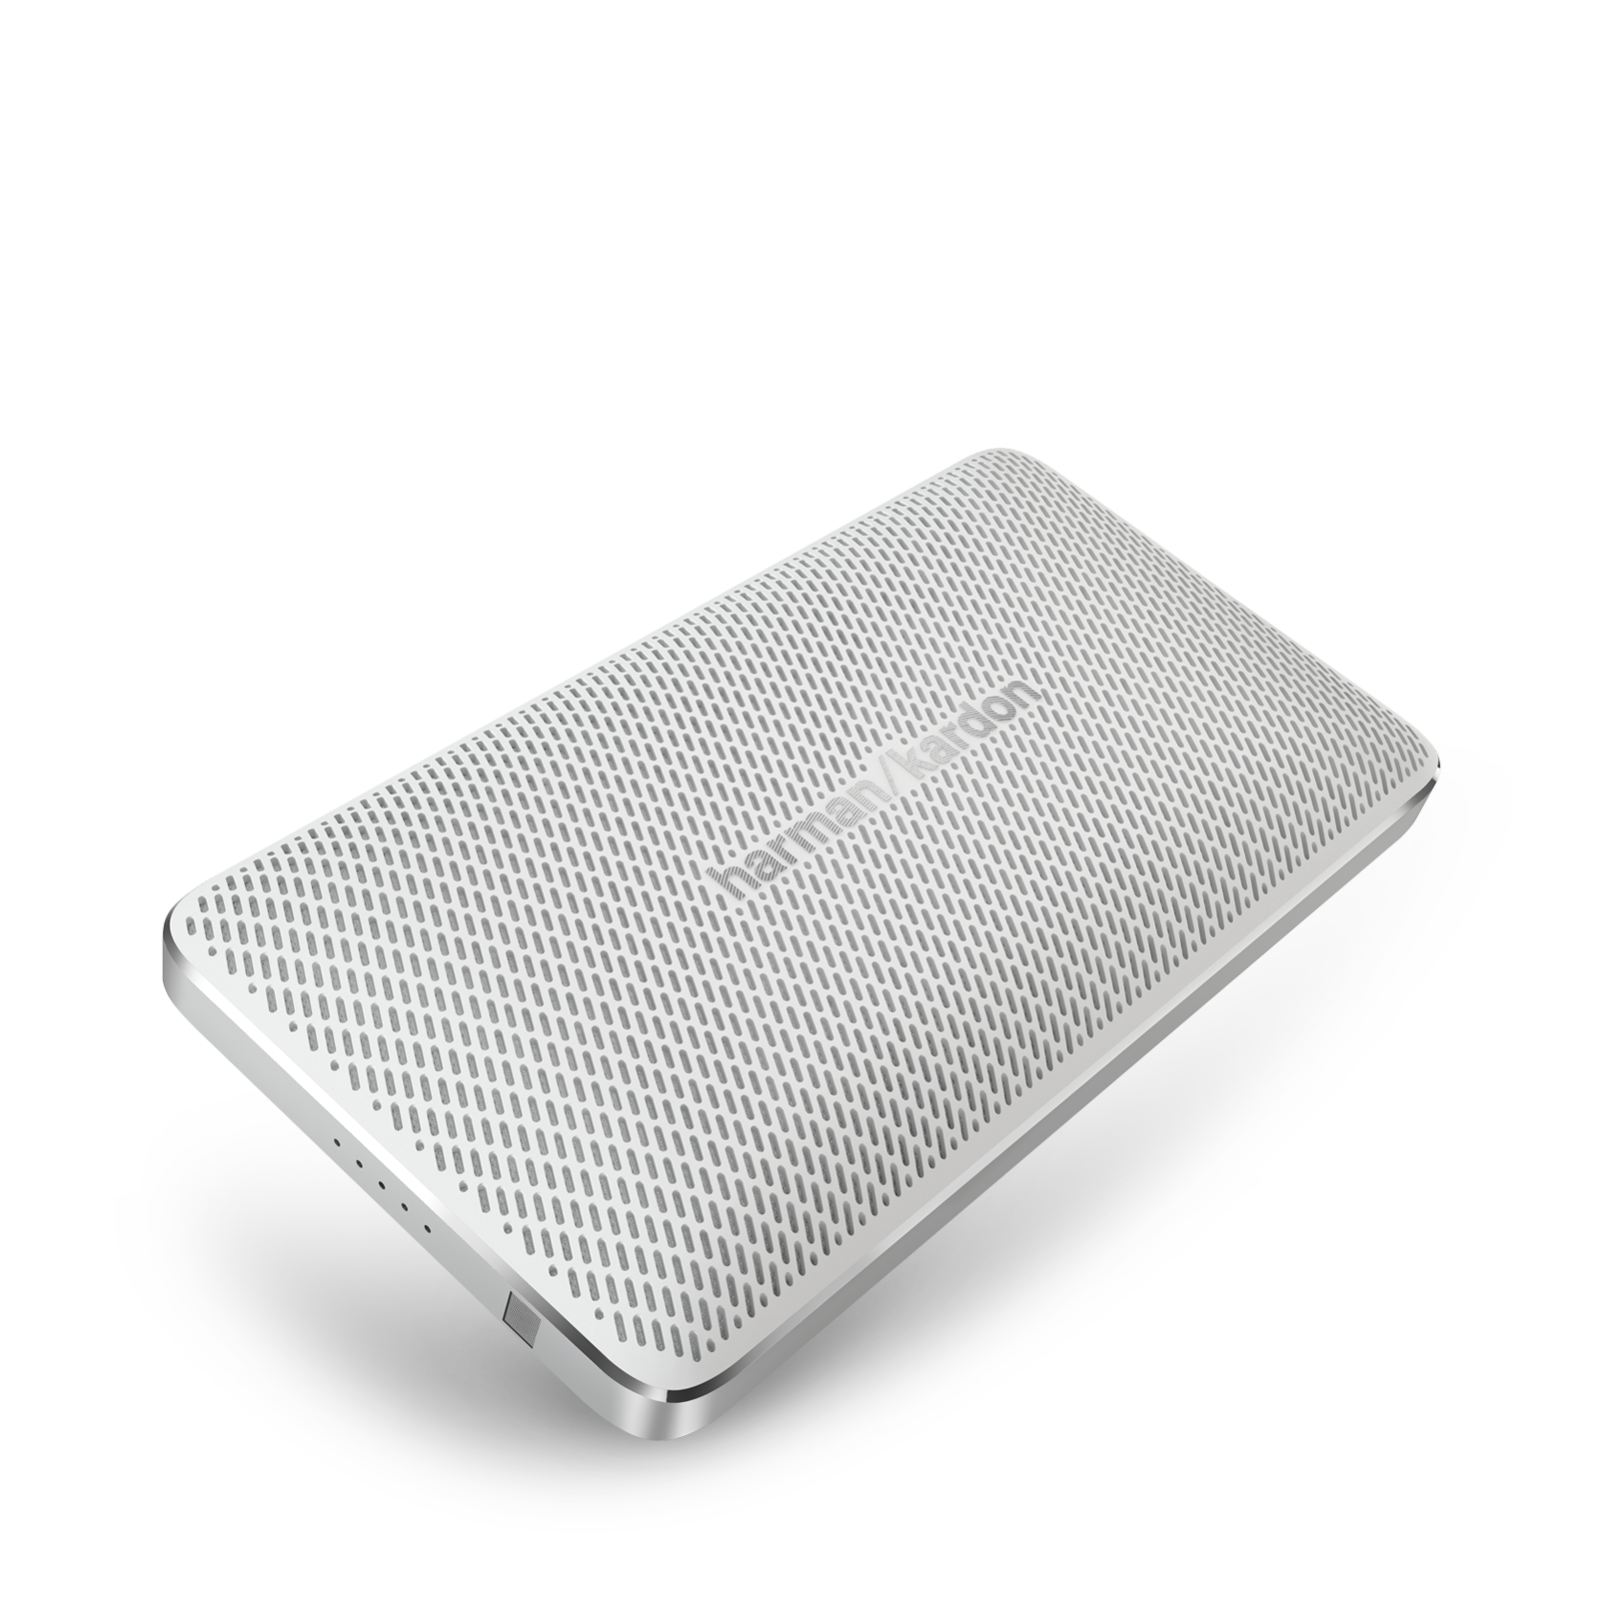 Esquire Mini - White - Wireless, portable speaker and conferencing system - Hero